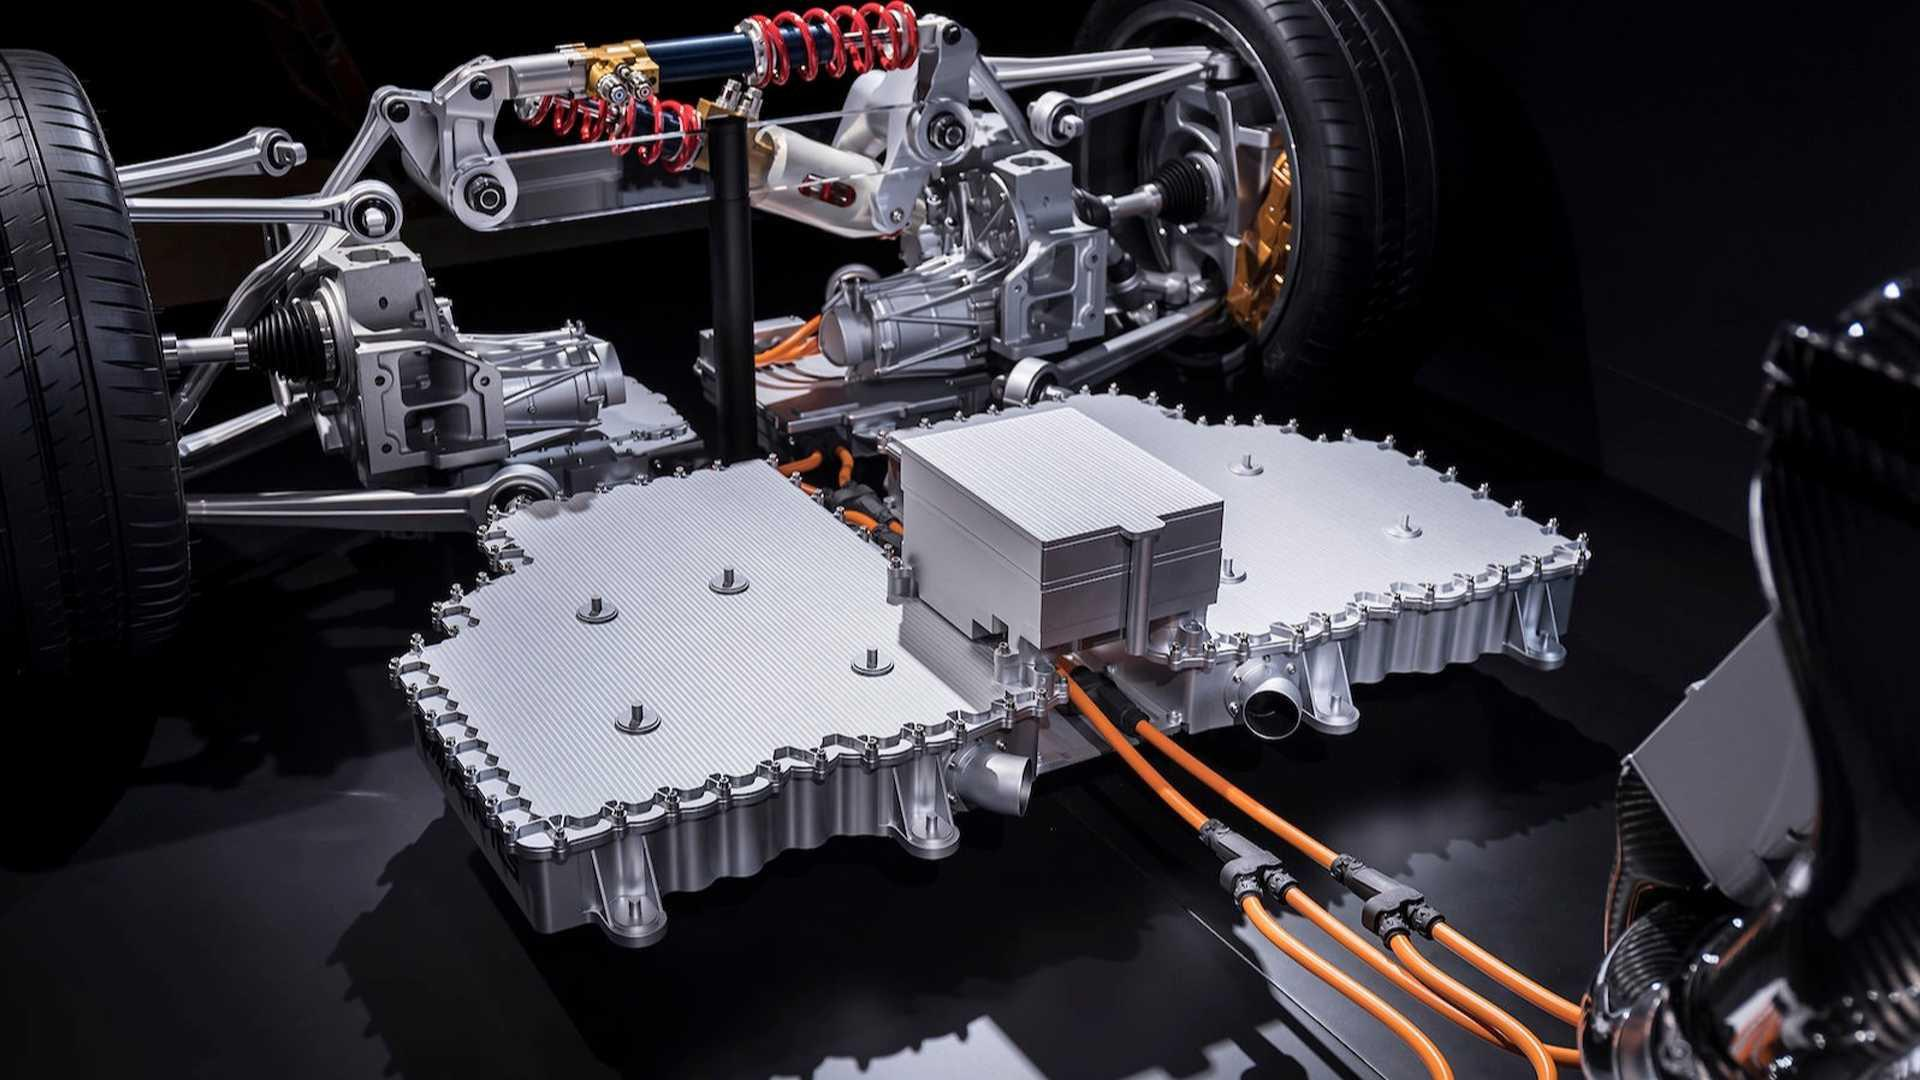 mercedes-amg-project-one-devoile-sa-mecanique-335-2.jpg